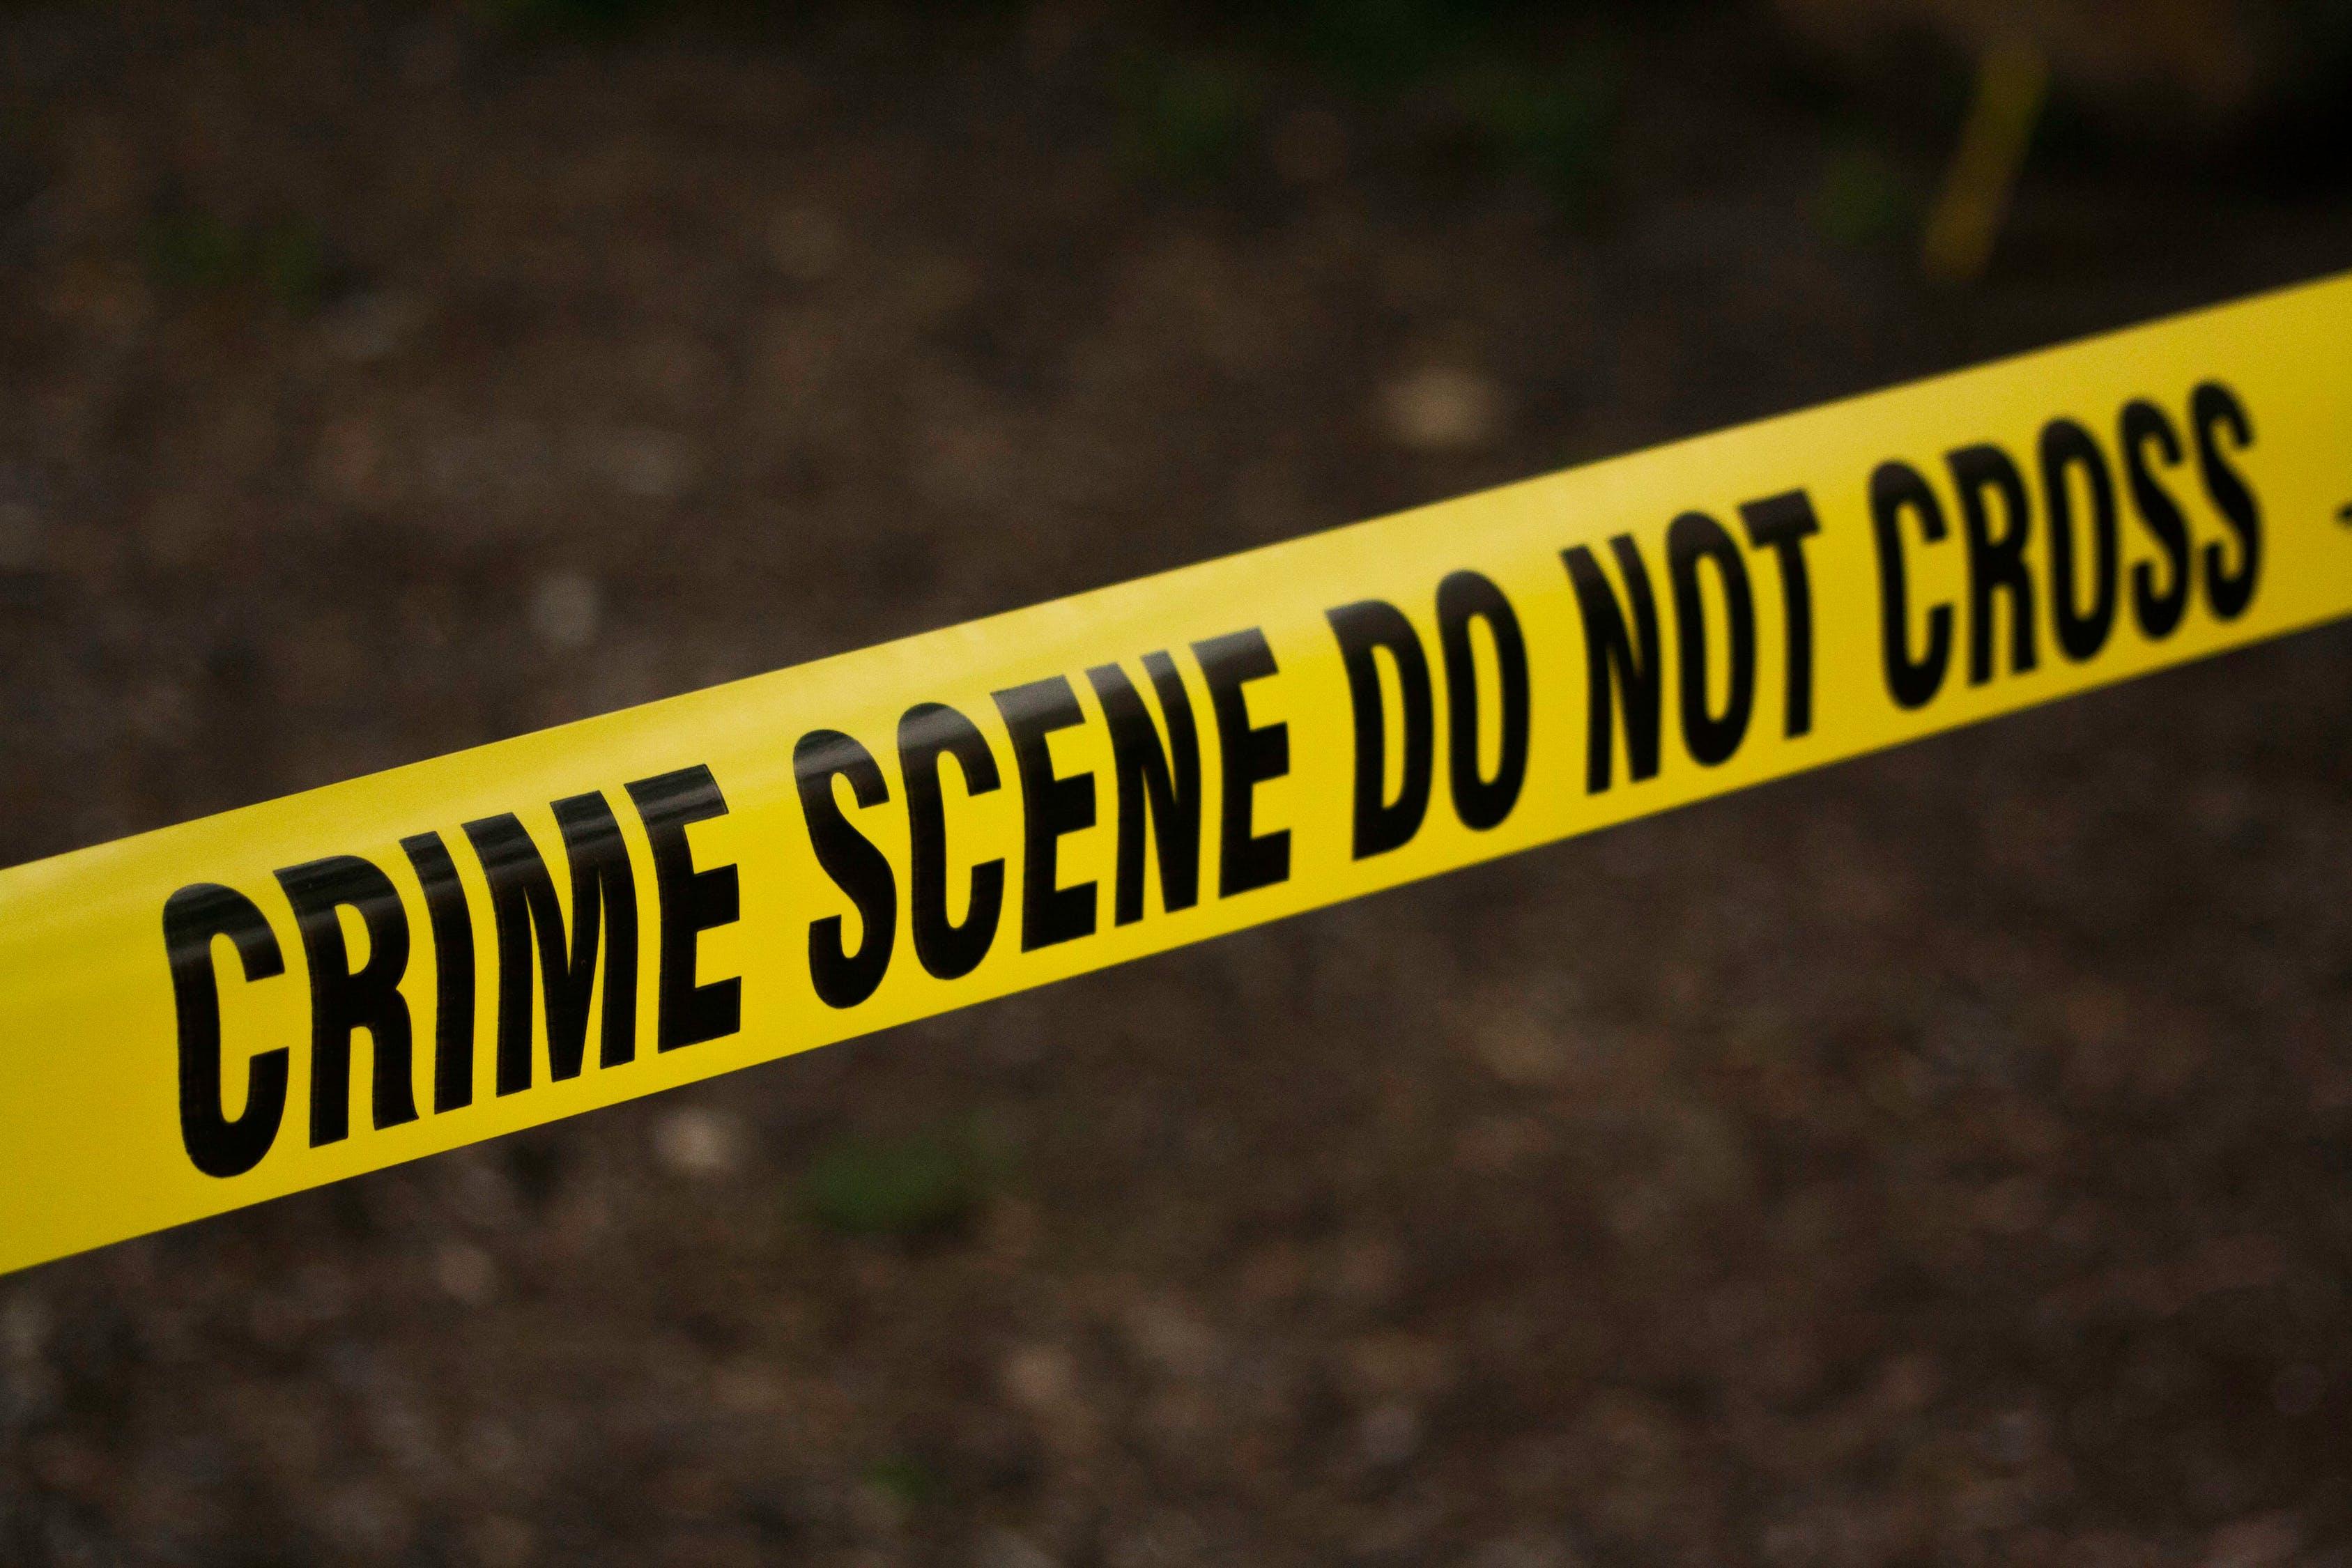 Johnson offers failed knife crime policies